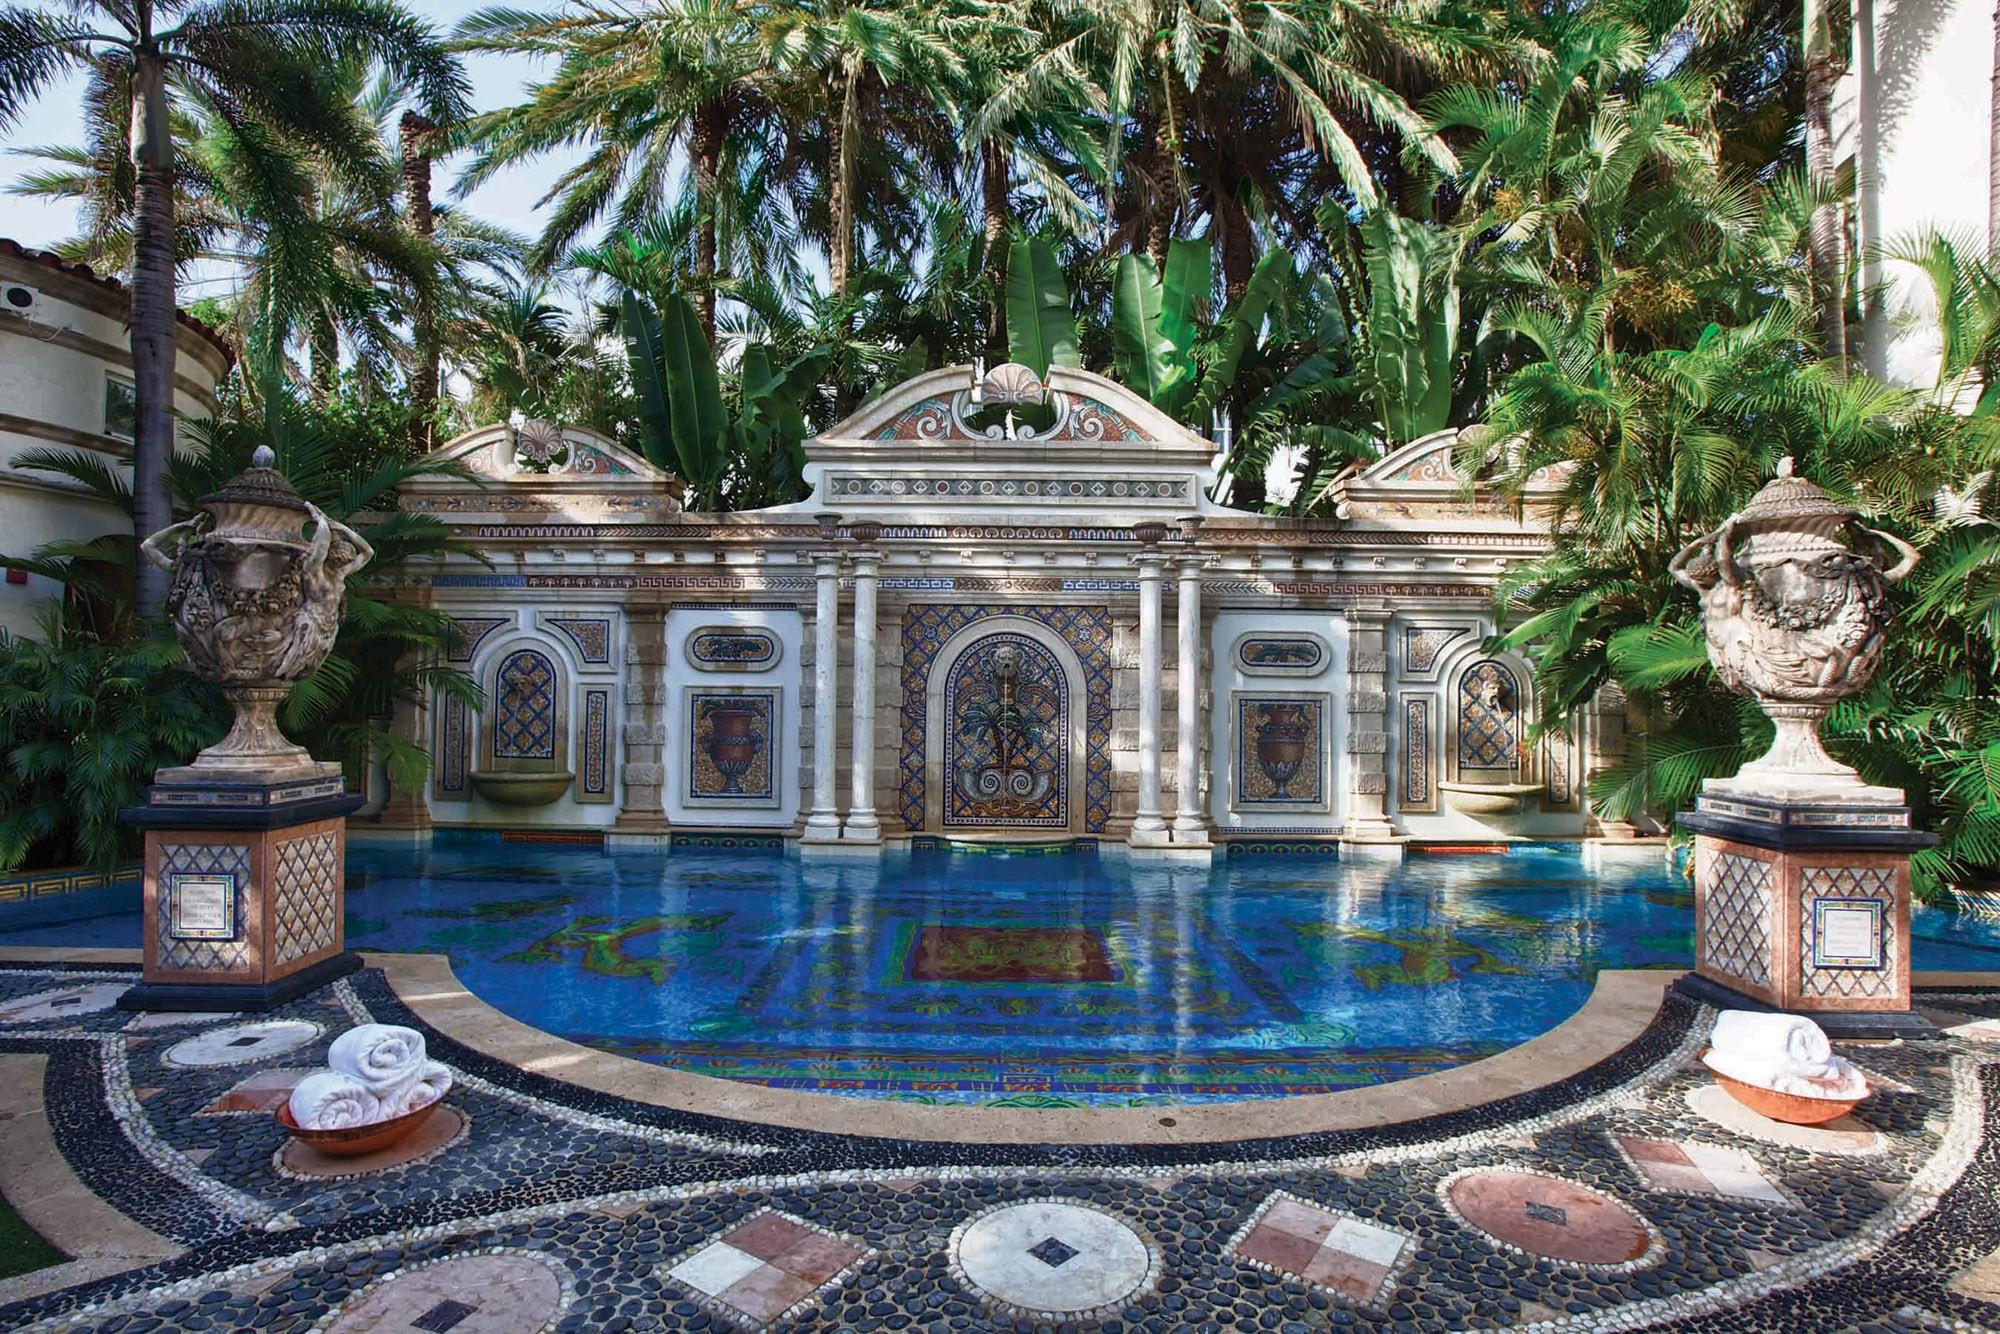 Gianni-Versace-Casa-Casuarina-Daytime-Million-Mosaic-Pool